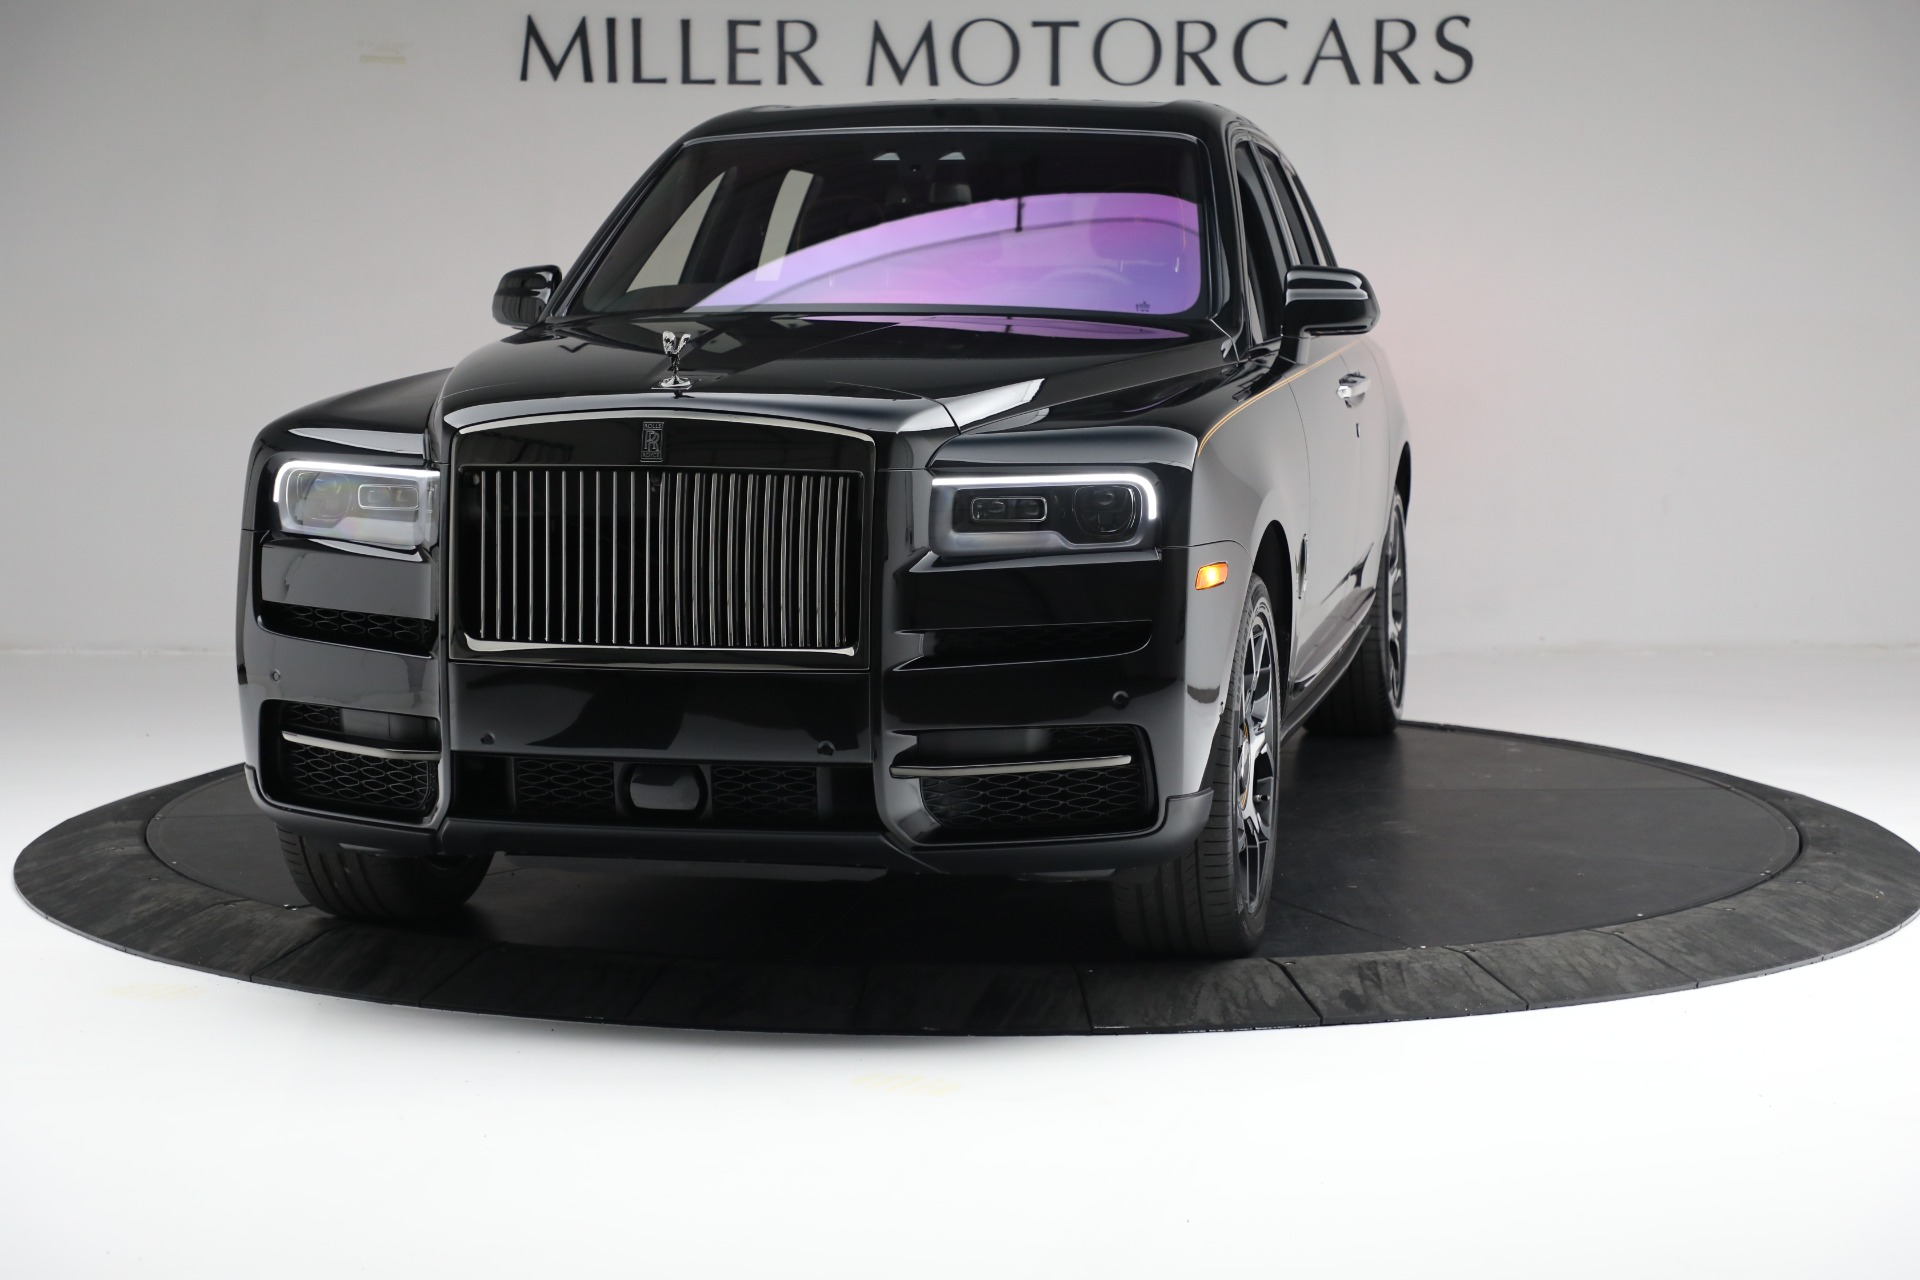 New 2020 Rolls-Royce Cullinan Black Badge for sale $436,275 at McLaren Greenwich in Greenwich CT 06830 1